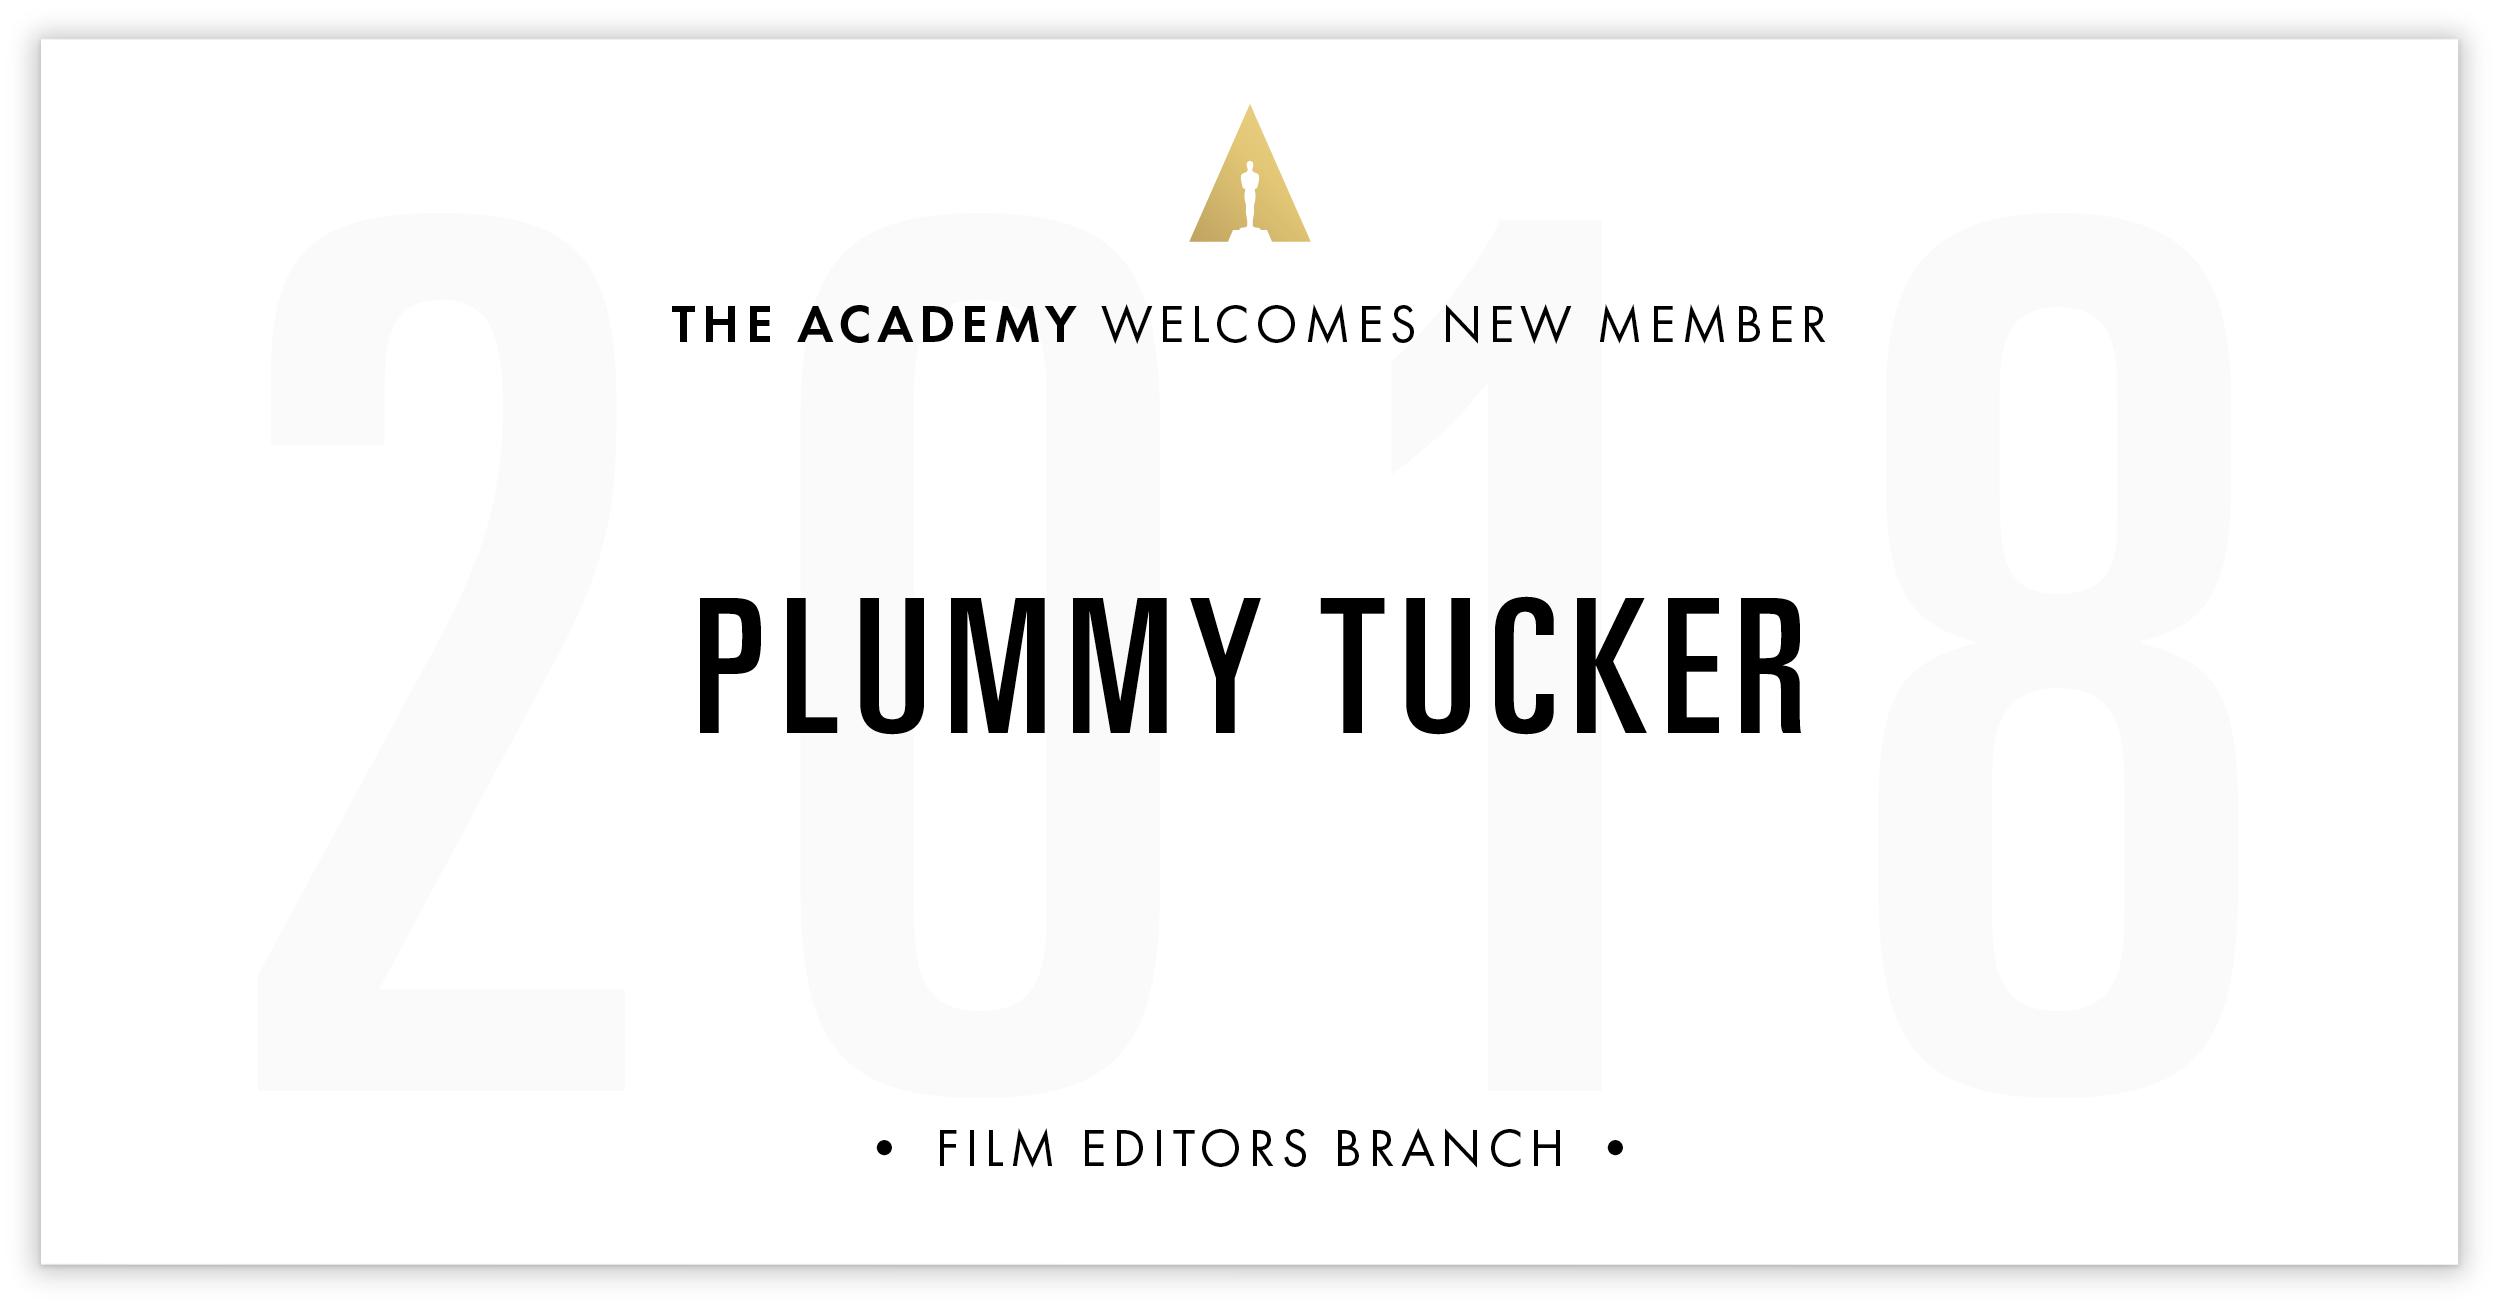 Plummy Tucker is invited!